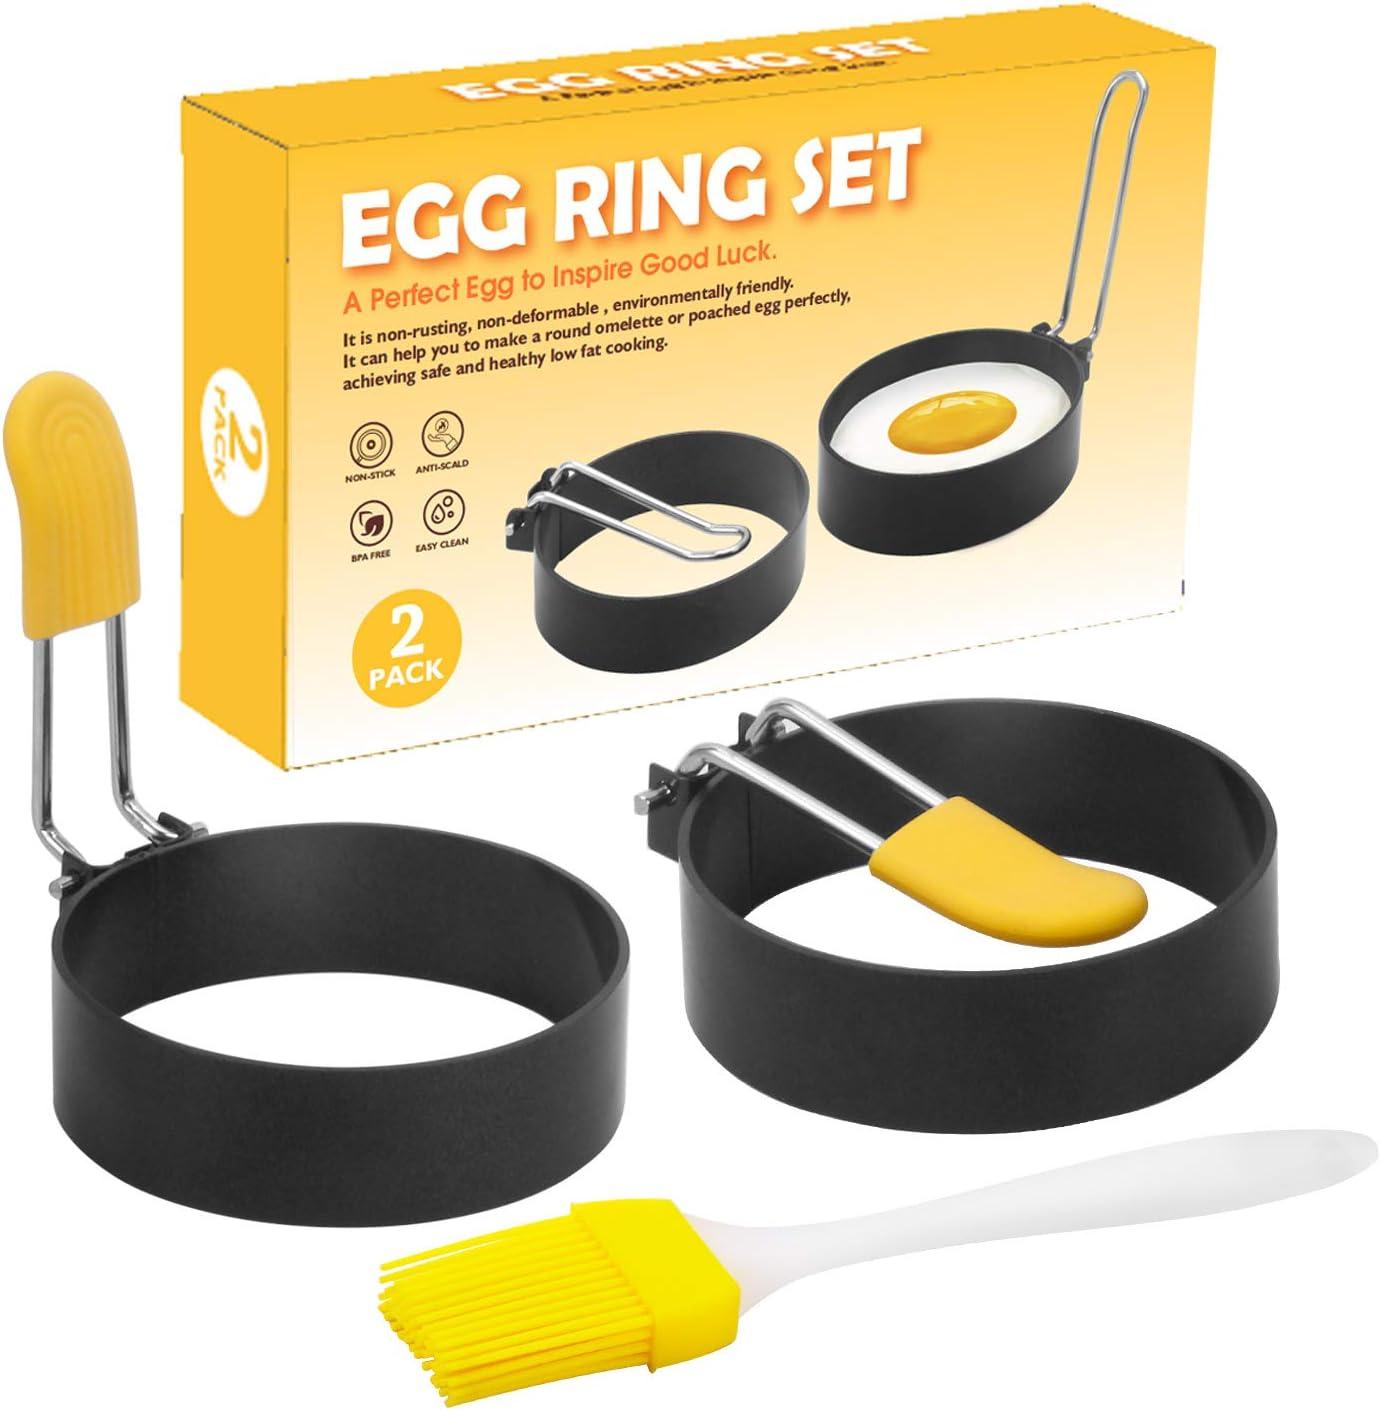 UPYEEJA Egg Rings for Frying Eggs, 2 Pack Nonstick Egg Cooking Rings (Oil Brush Included), Egg Mold for Cooking, Round Egg Cooker Ring